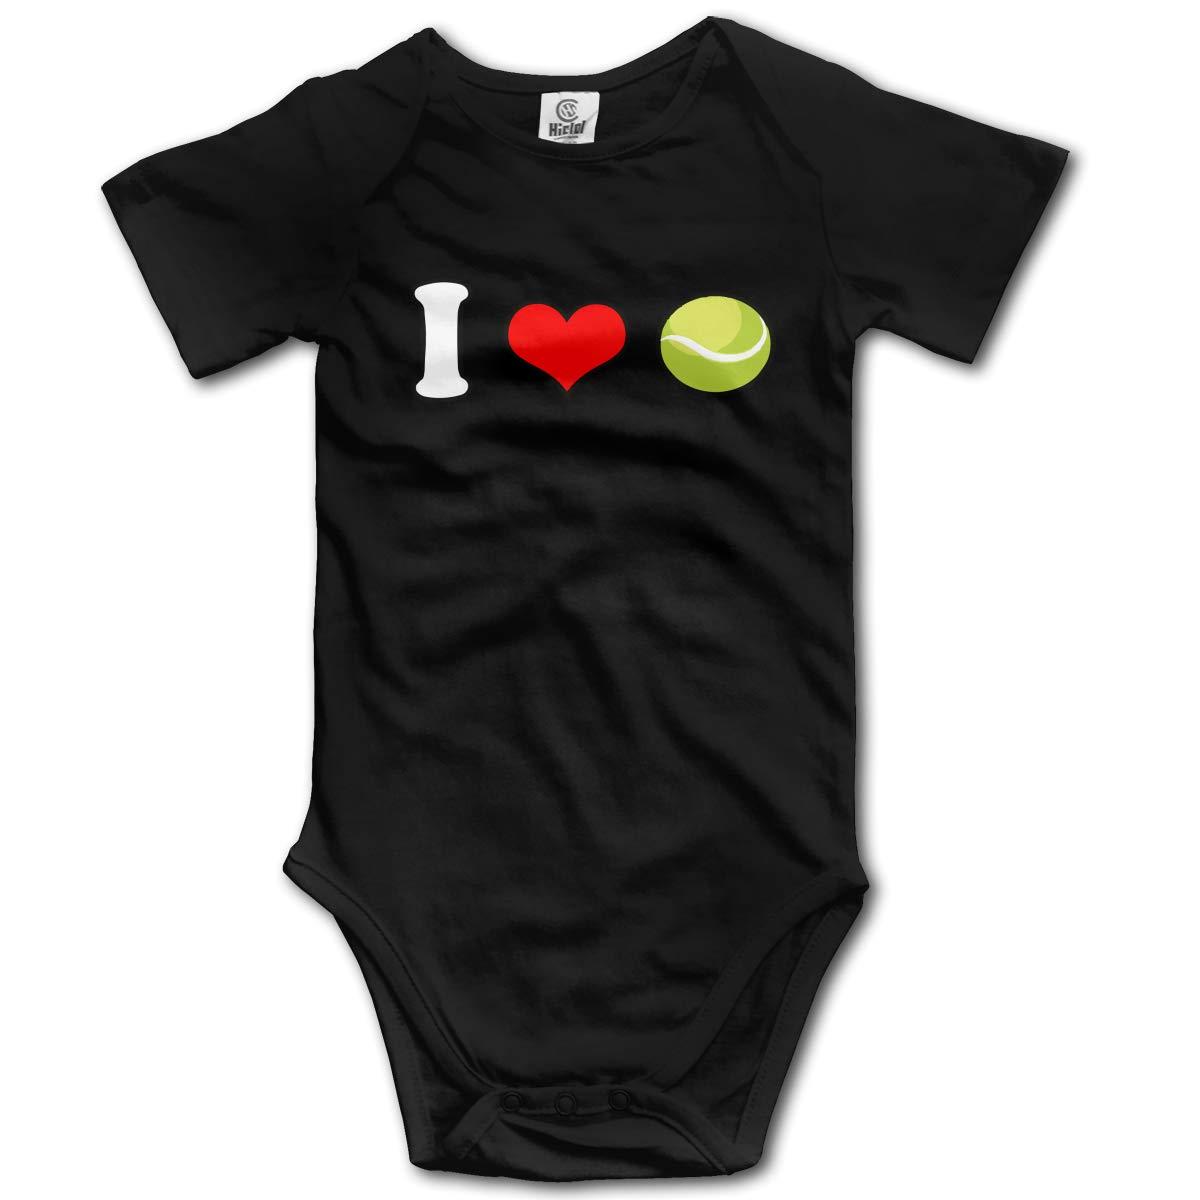 Toddler I Love Tennis Short Sleeve Climbing Clothes Bodysuits Jumpsuit Suit 6-24 Months